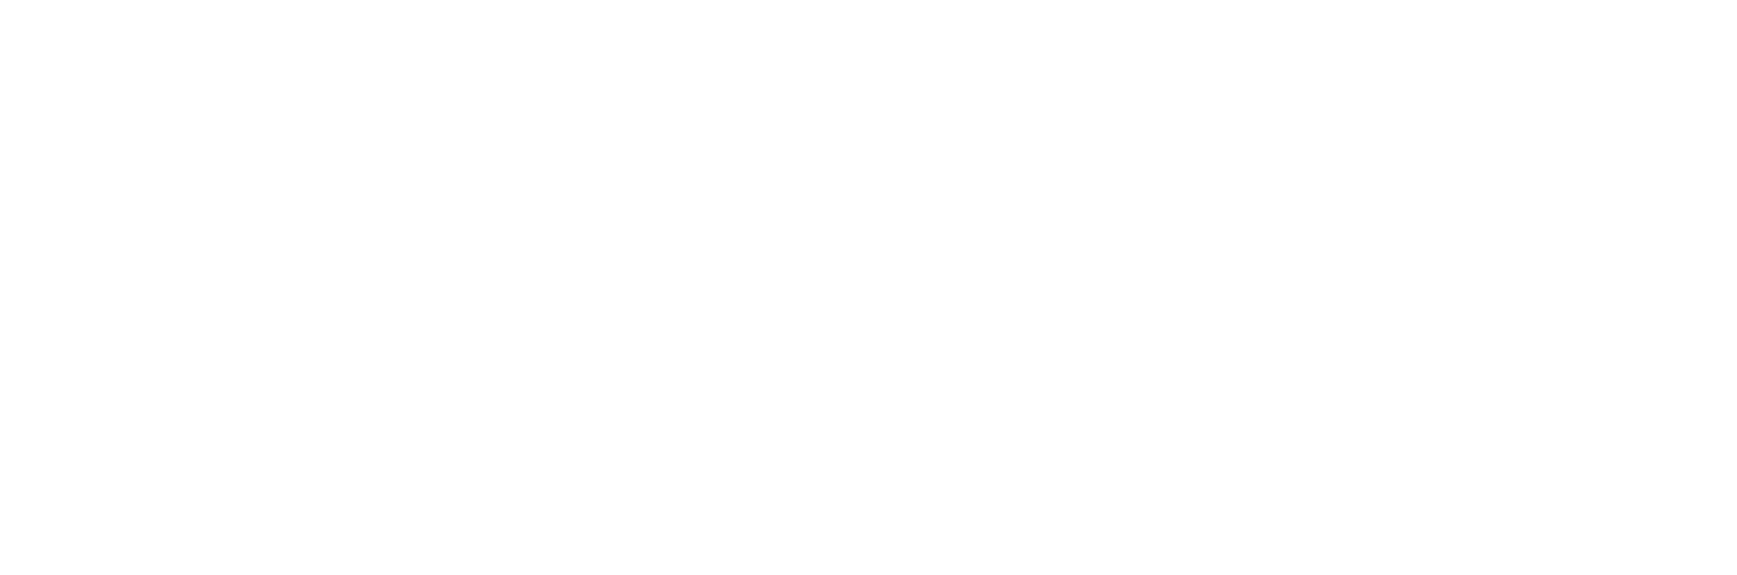 Rangewell Limited logo